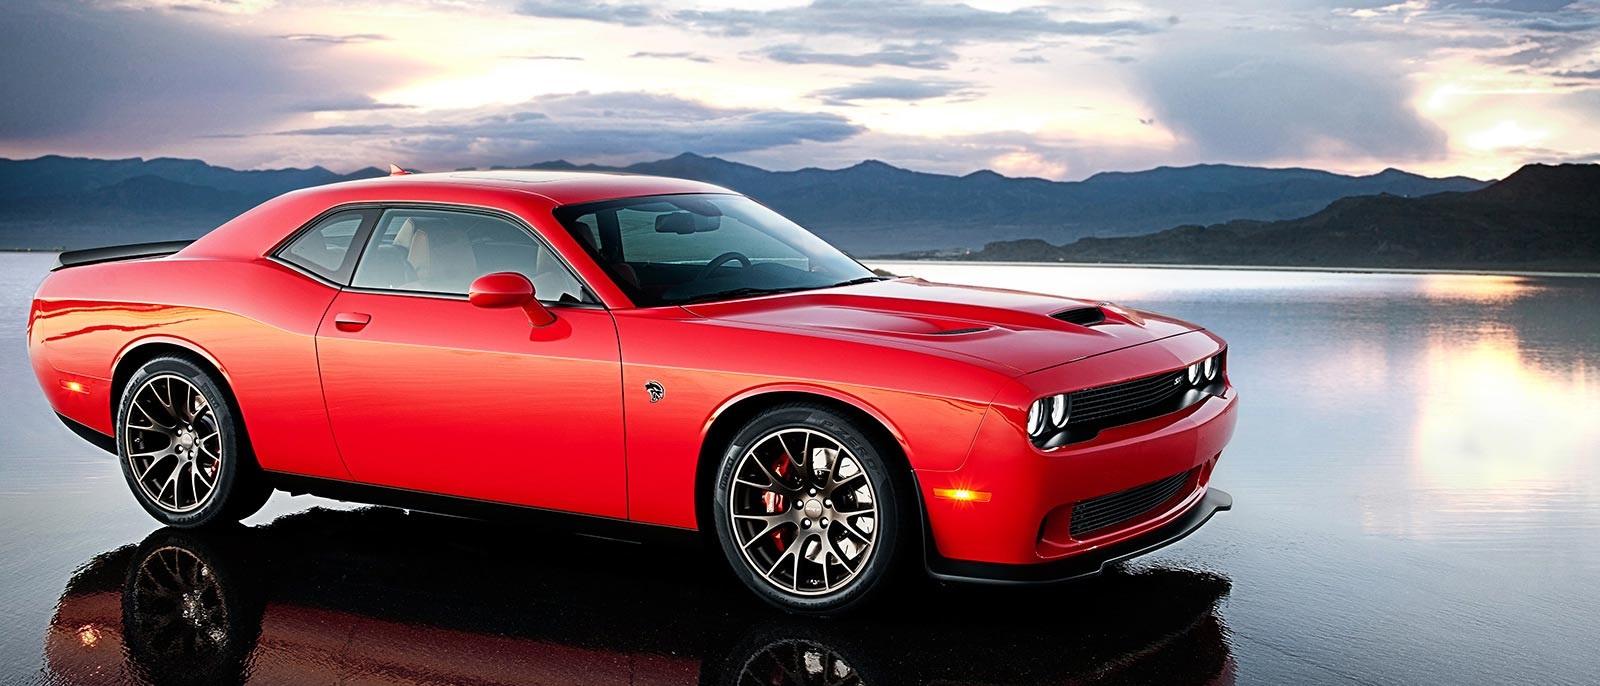 2016 Dodge Challenger Red